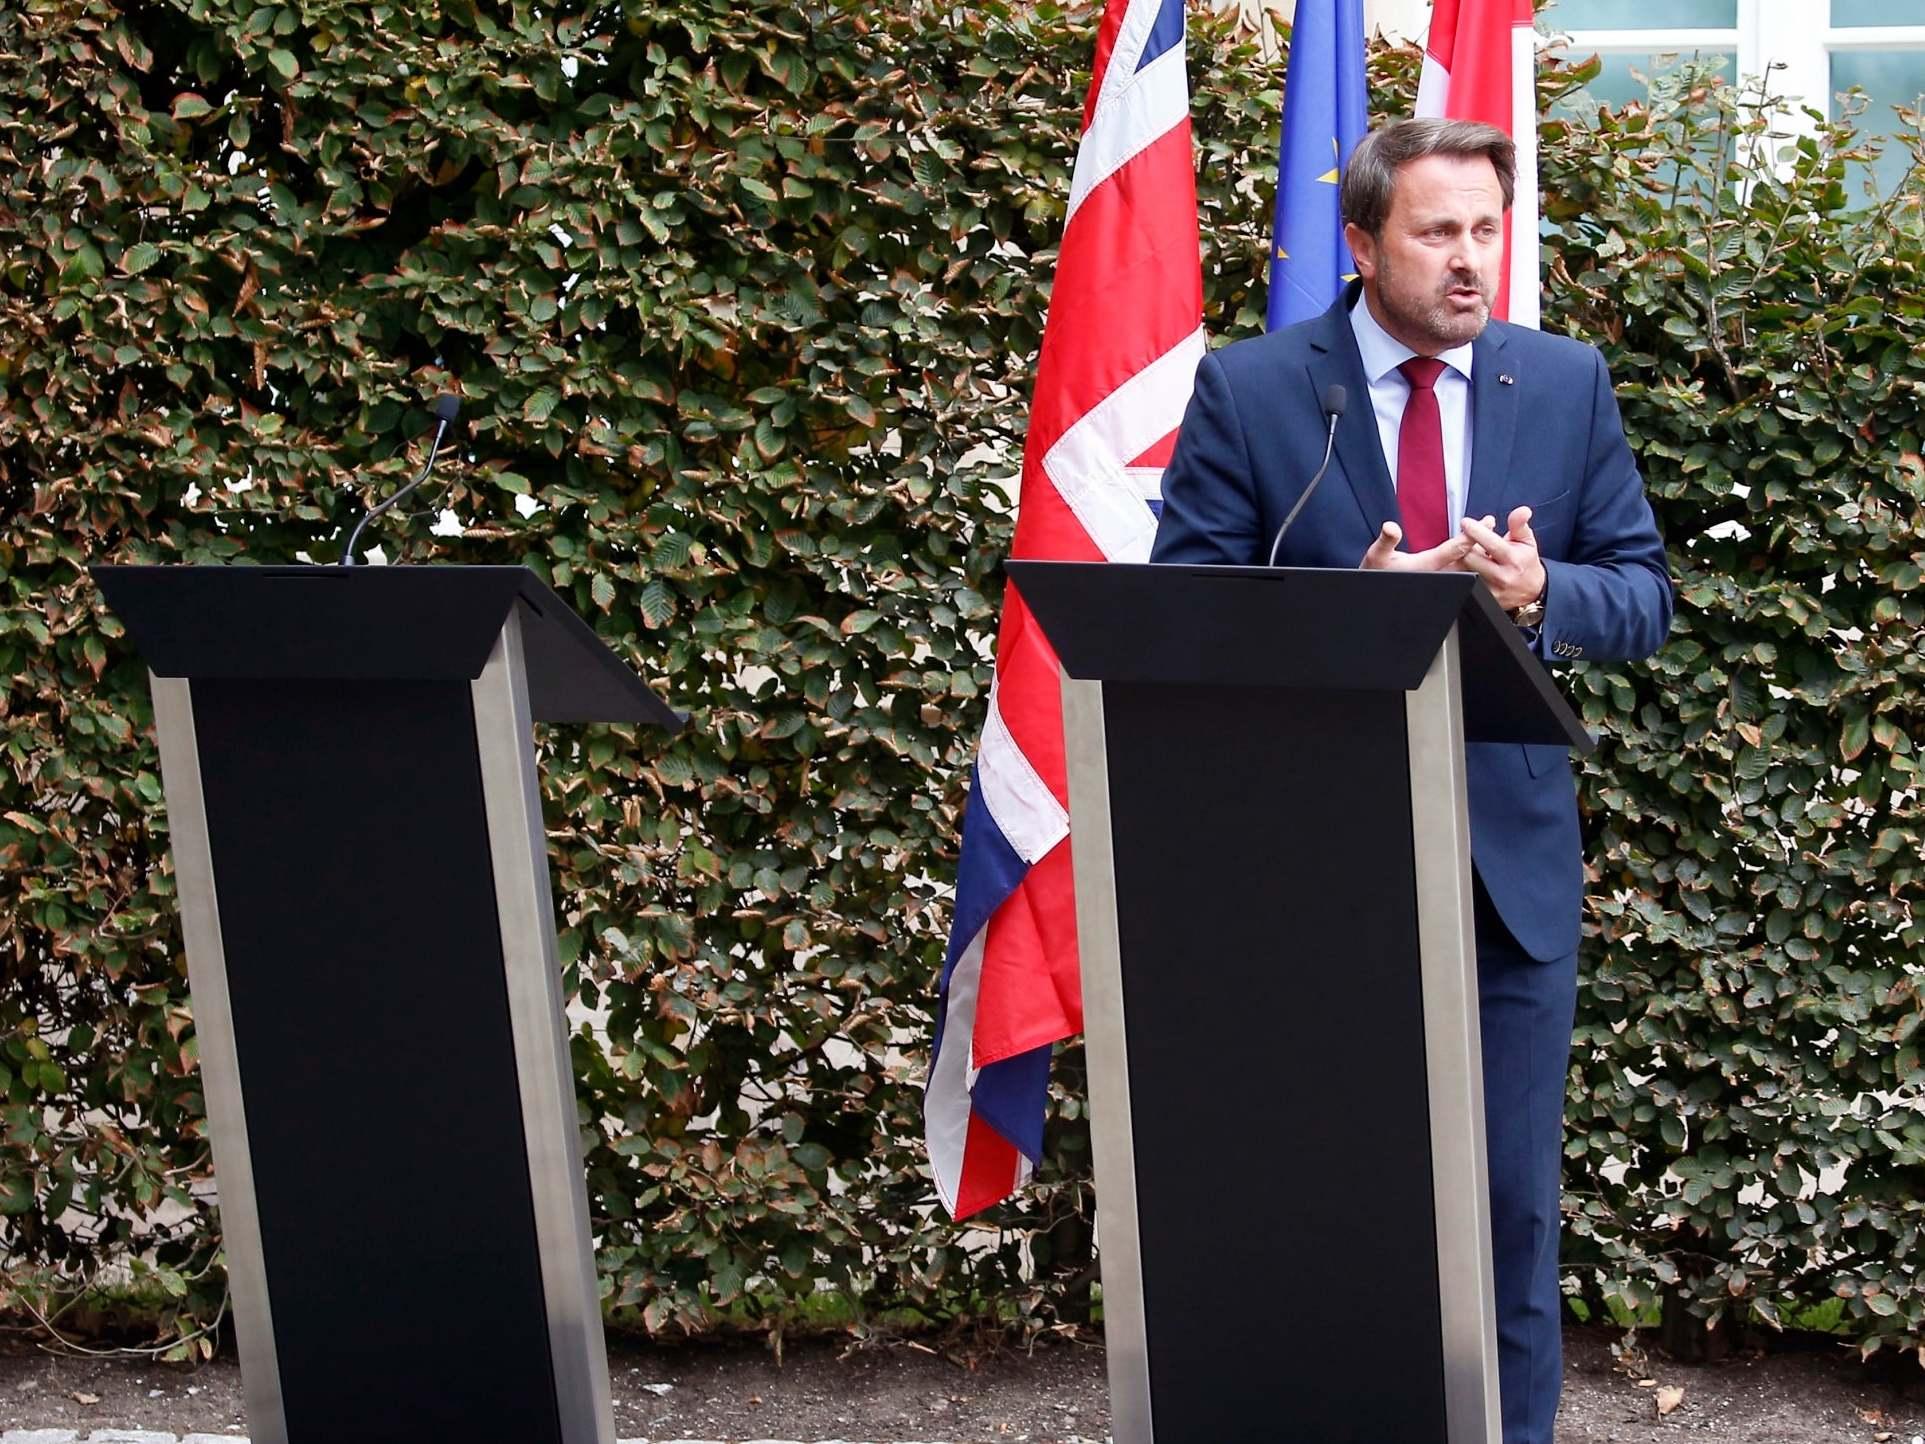 'Extraordinary behaviour': Furious Tories invoke Second World War after Luxembourg leader's Boris Johnson press conference